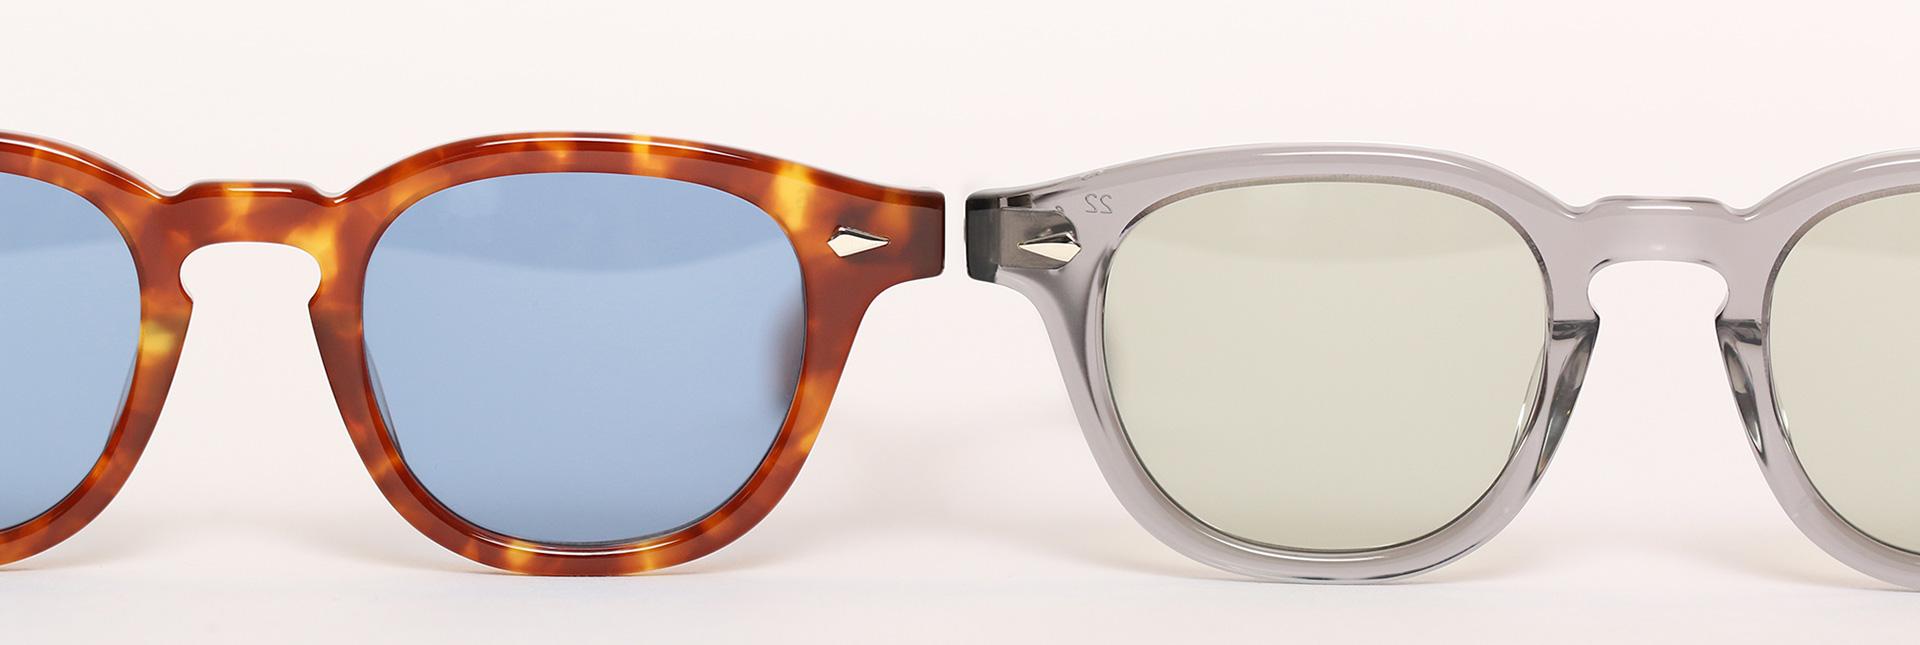 Julius Tart Optical® Sunglasses